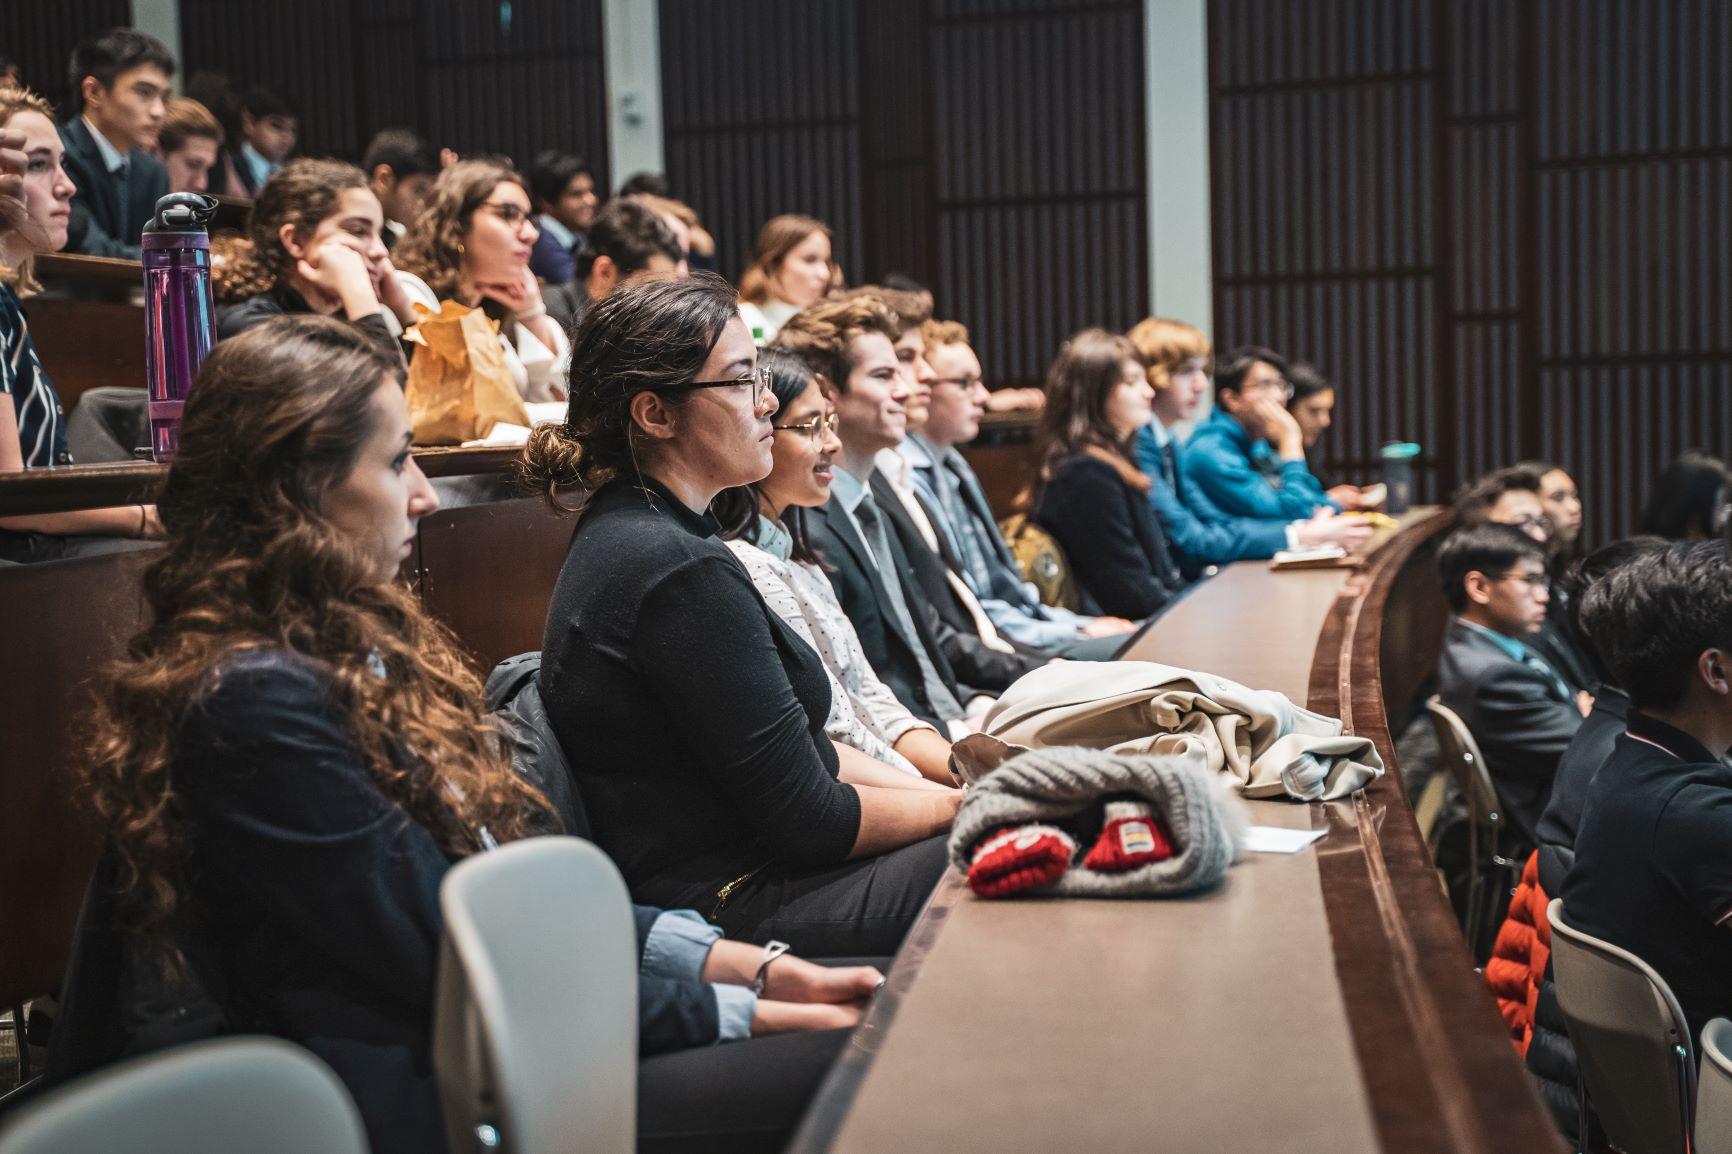 ESEC 2020 Audience Listening